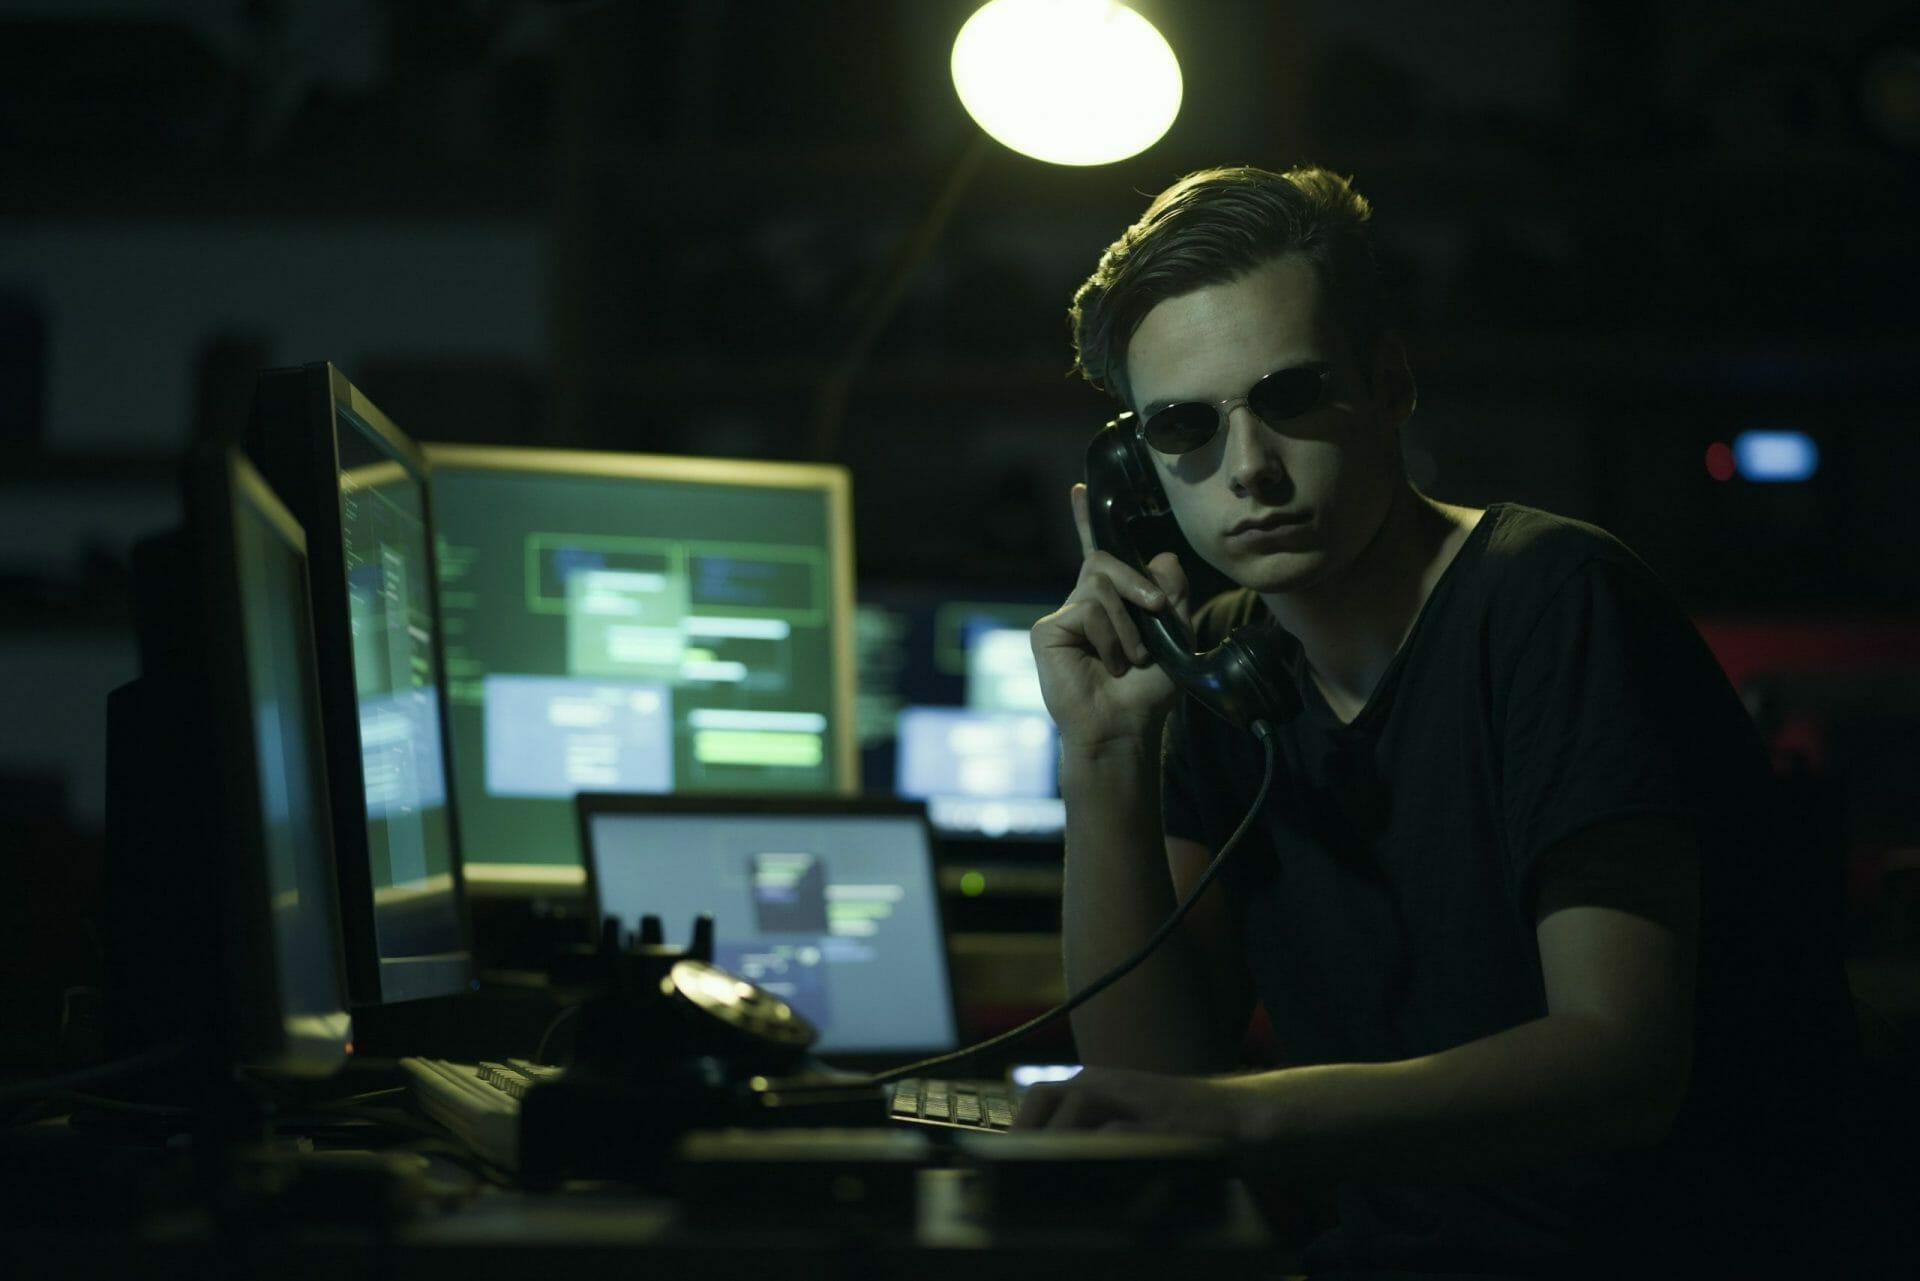 computer hacker making a phone call